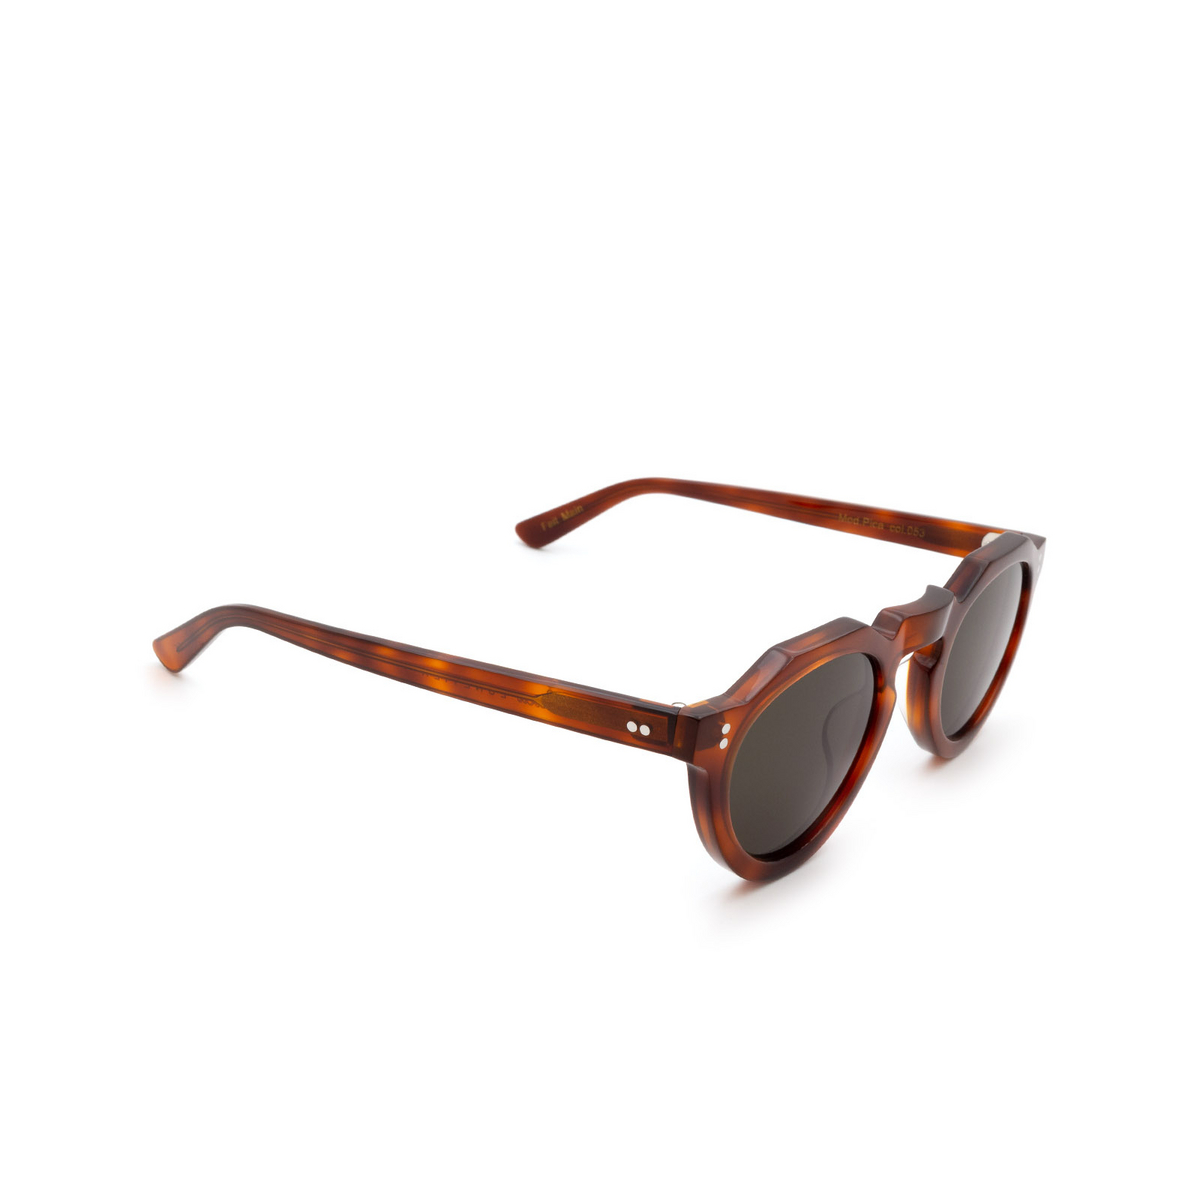 Lesca® Irregular Sunglasses: Pica Sun color Light Tortoise 53 - three-quarters view.